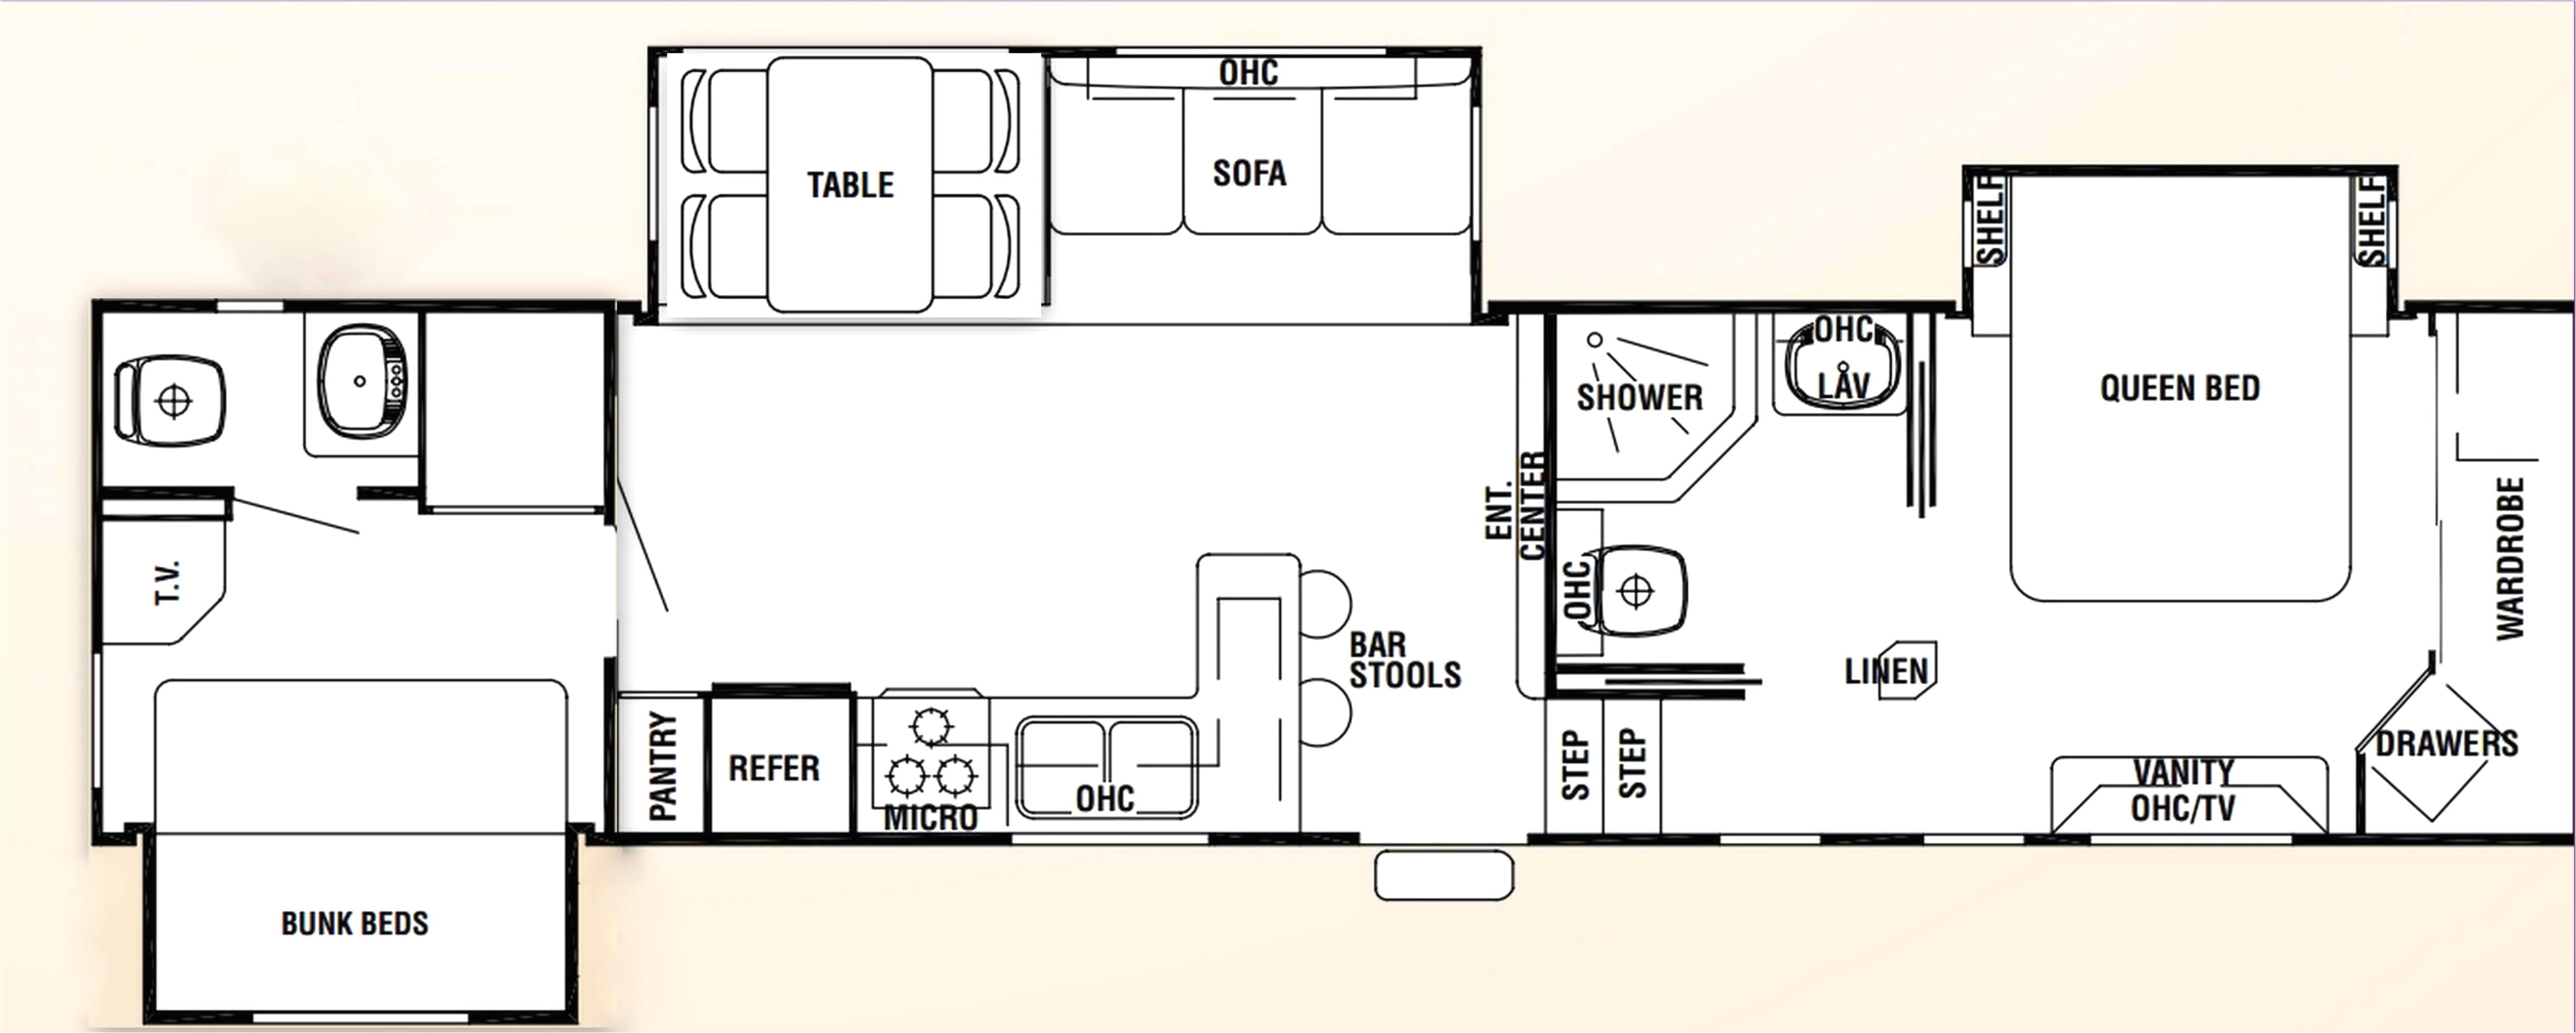 fifth wheel tiny house plans 5th wheel tiny home plans fresh 3 bedroom fifth wheel home